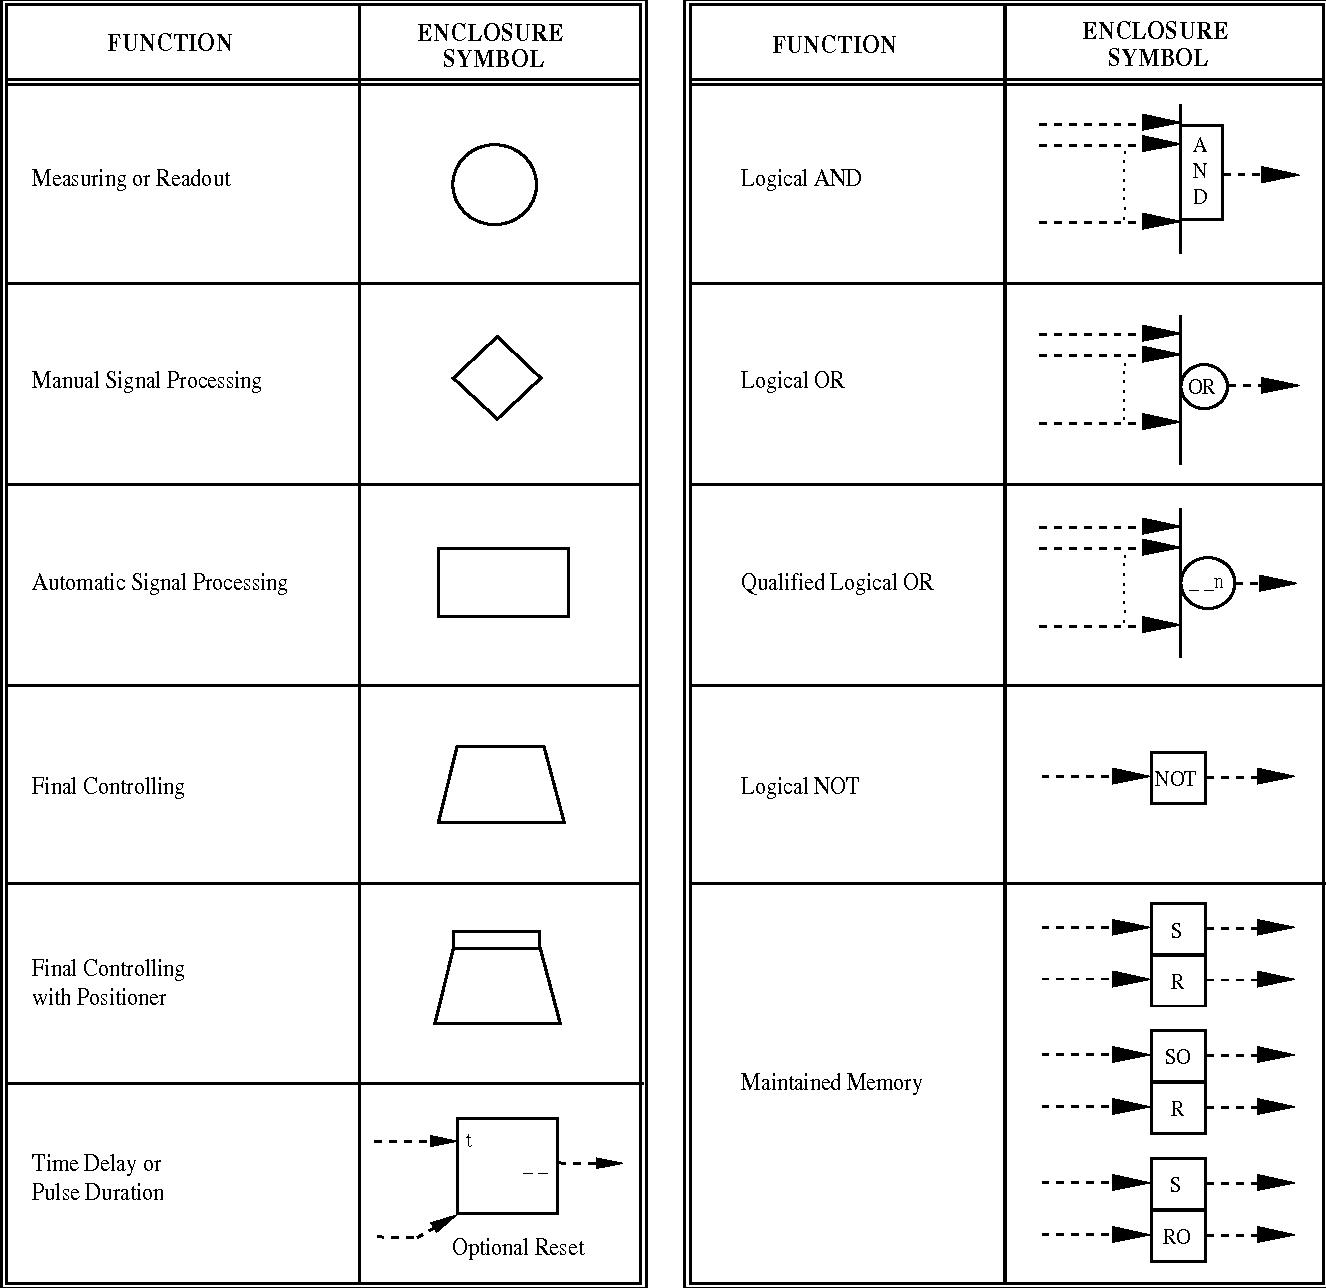 Figure 6 from 2 Processed Signal Continuation Symbols | Semantic ScholarSemantic Scholar